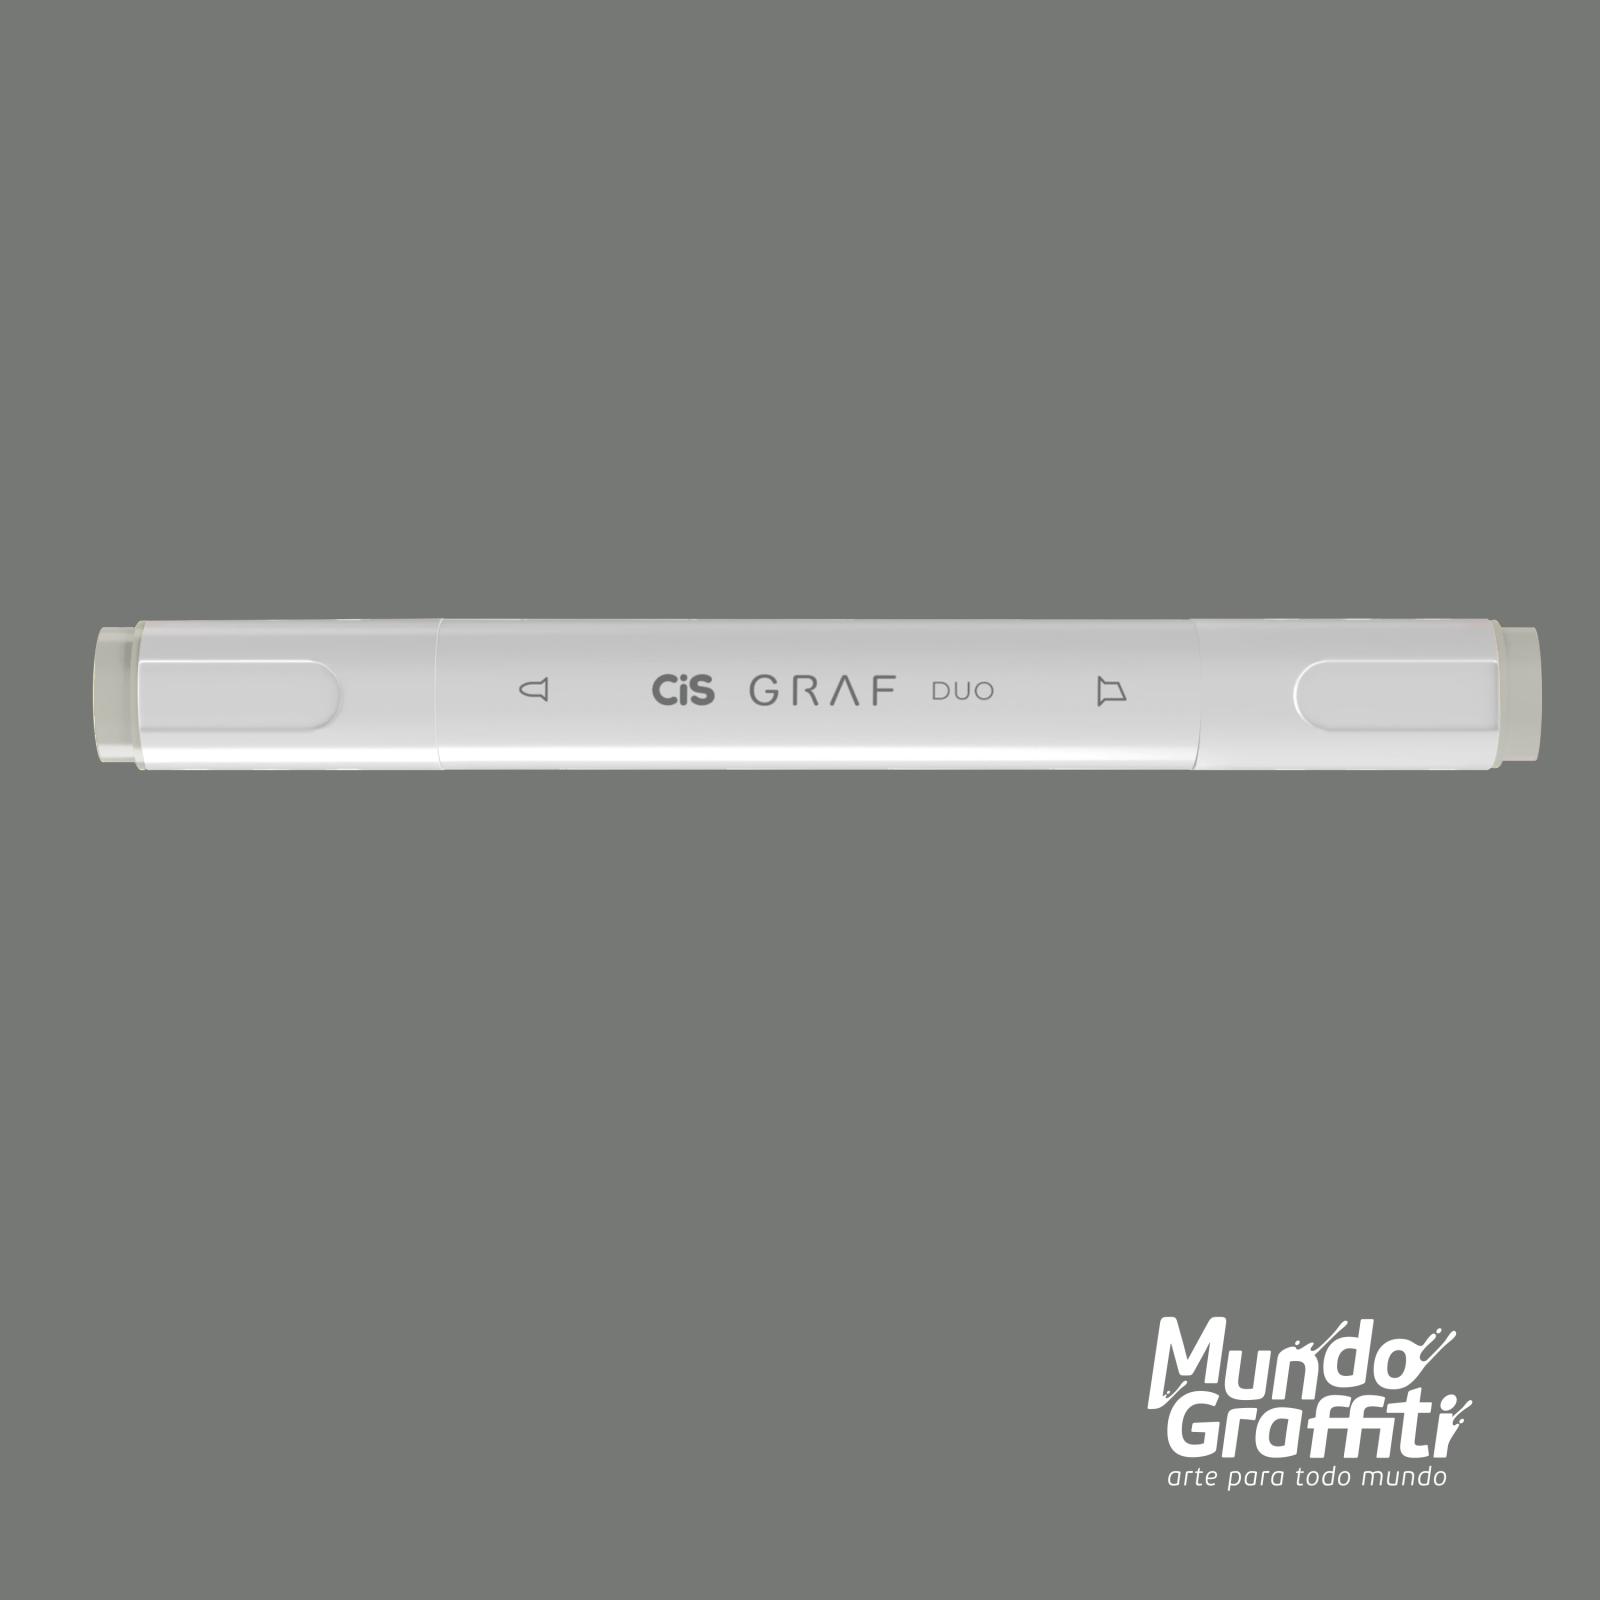 Marcador Cis Graf Duo Cool Grey CG3 - Mundo Graffiti